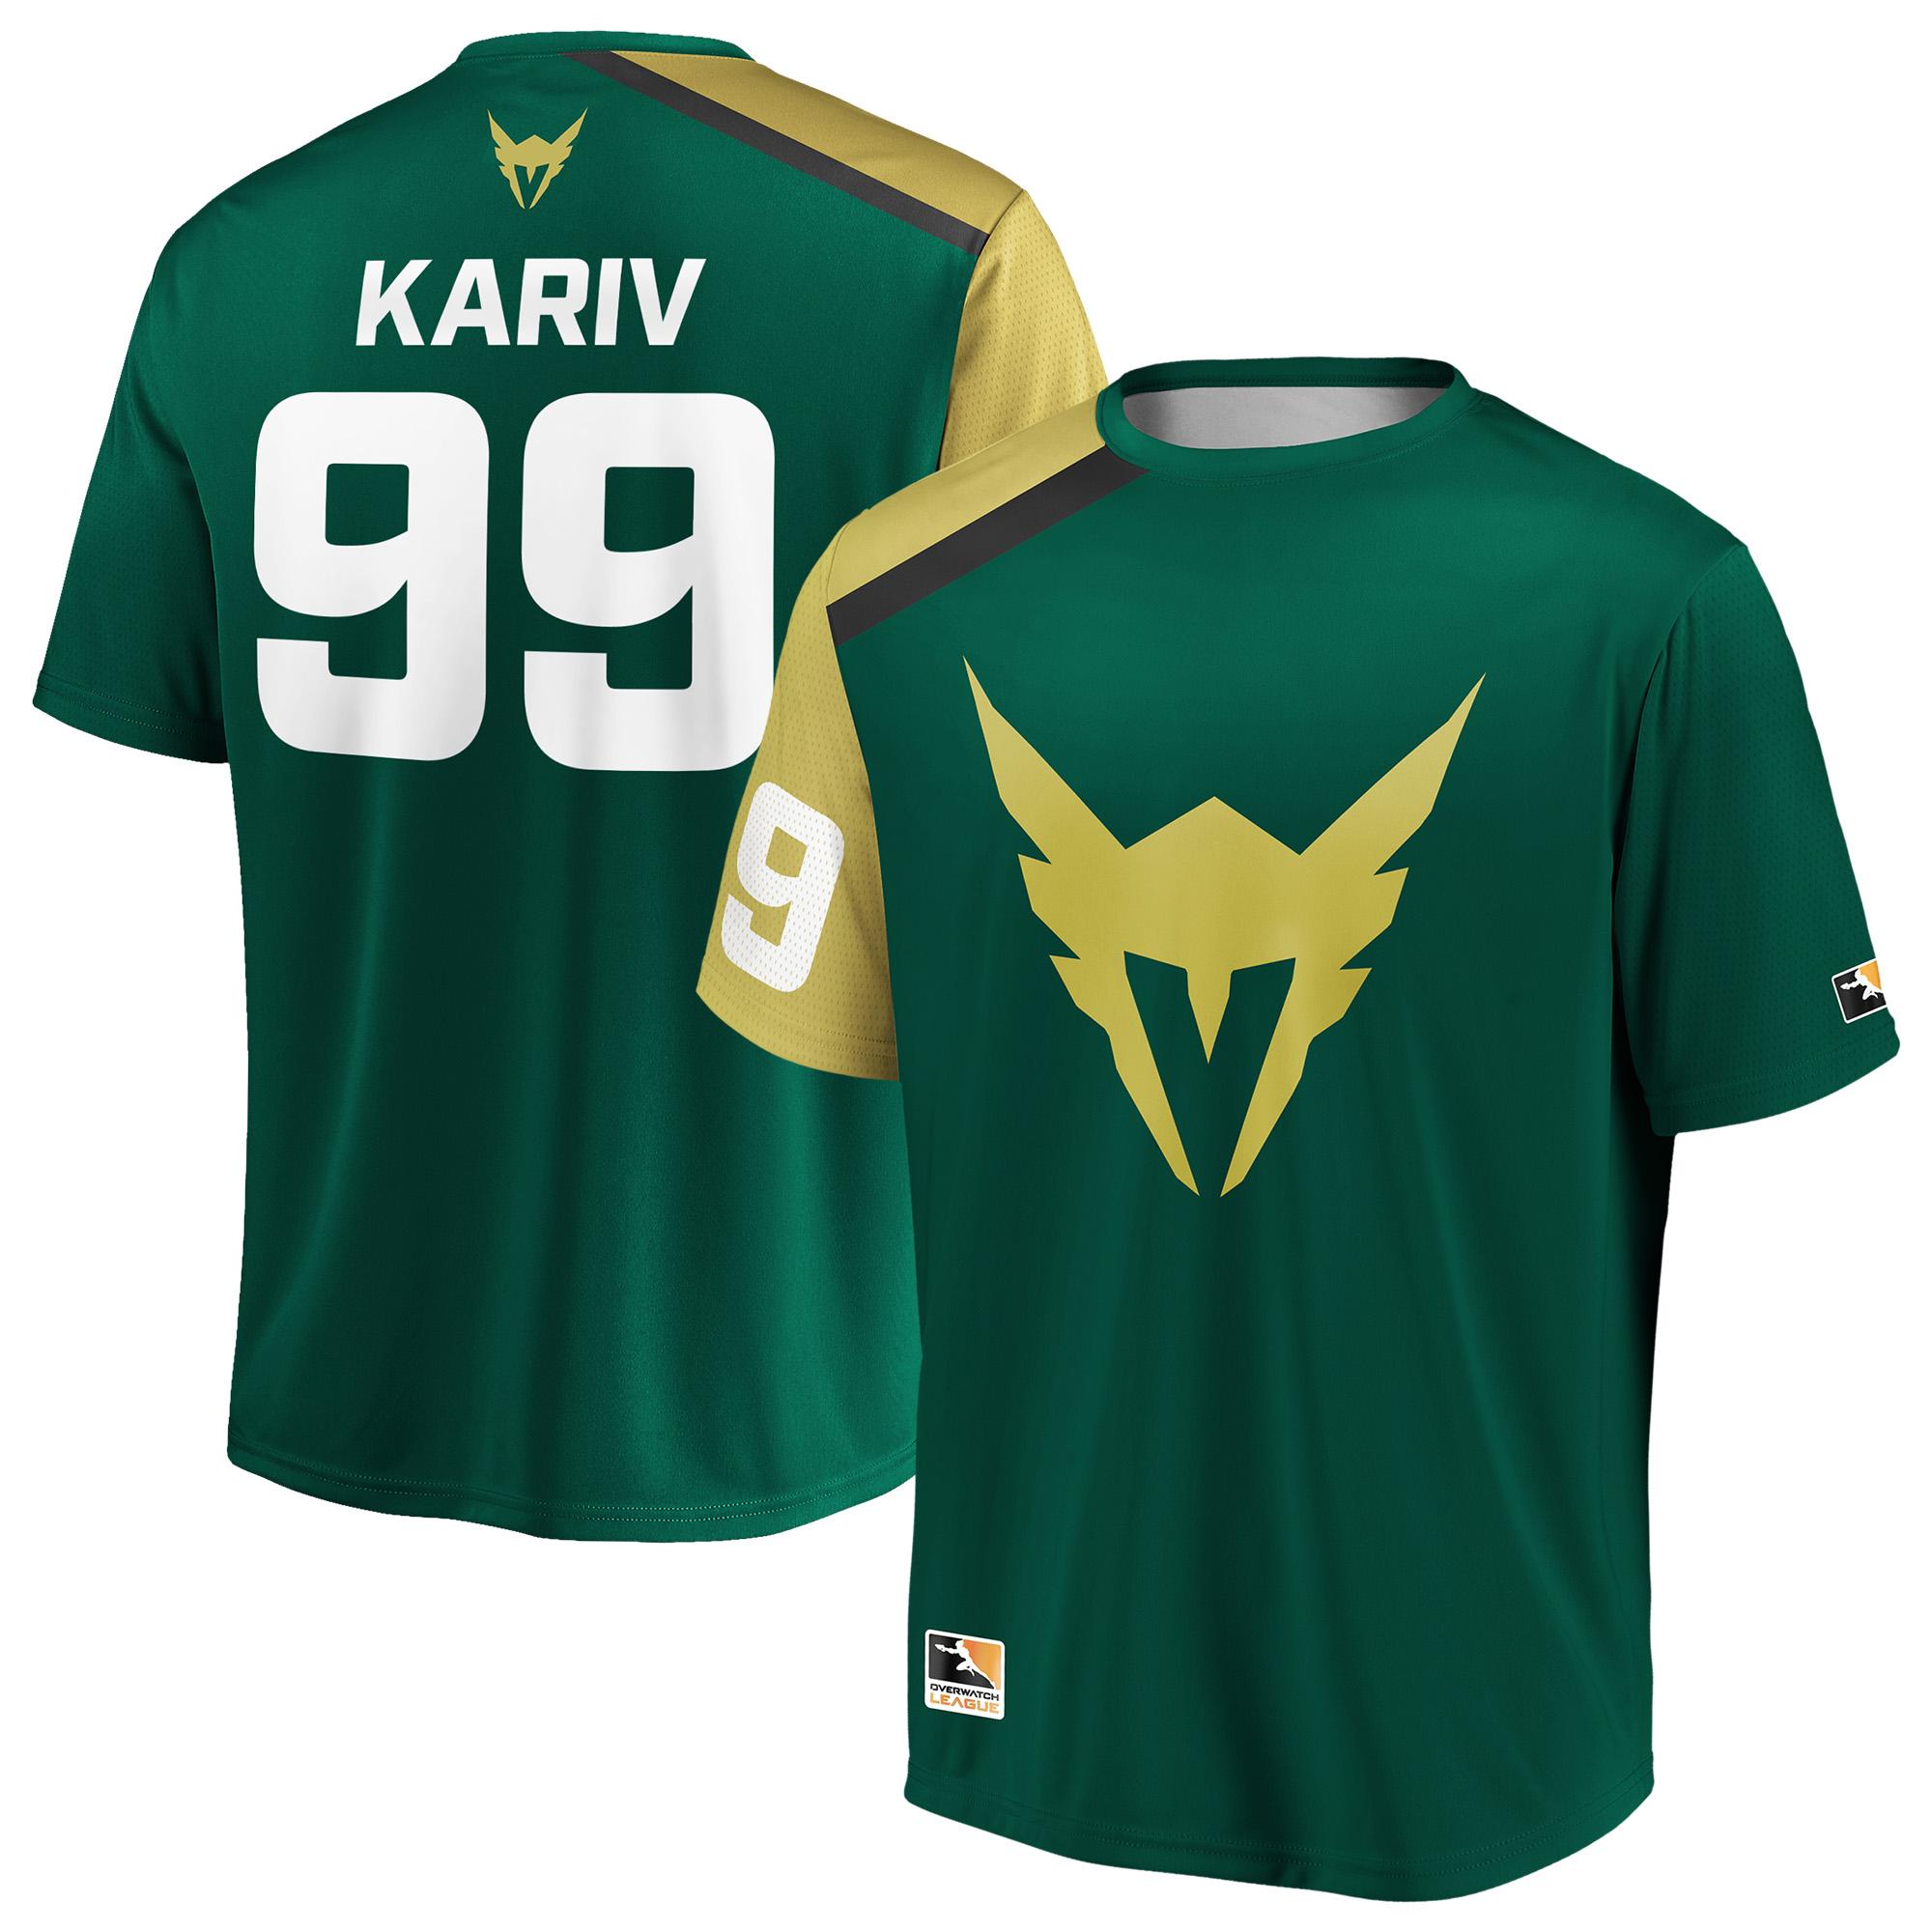 KariV Los Angeles Valiant Overwatch League Replica Home Jersey - Green